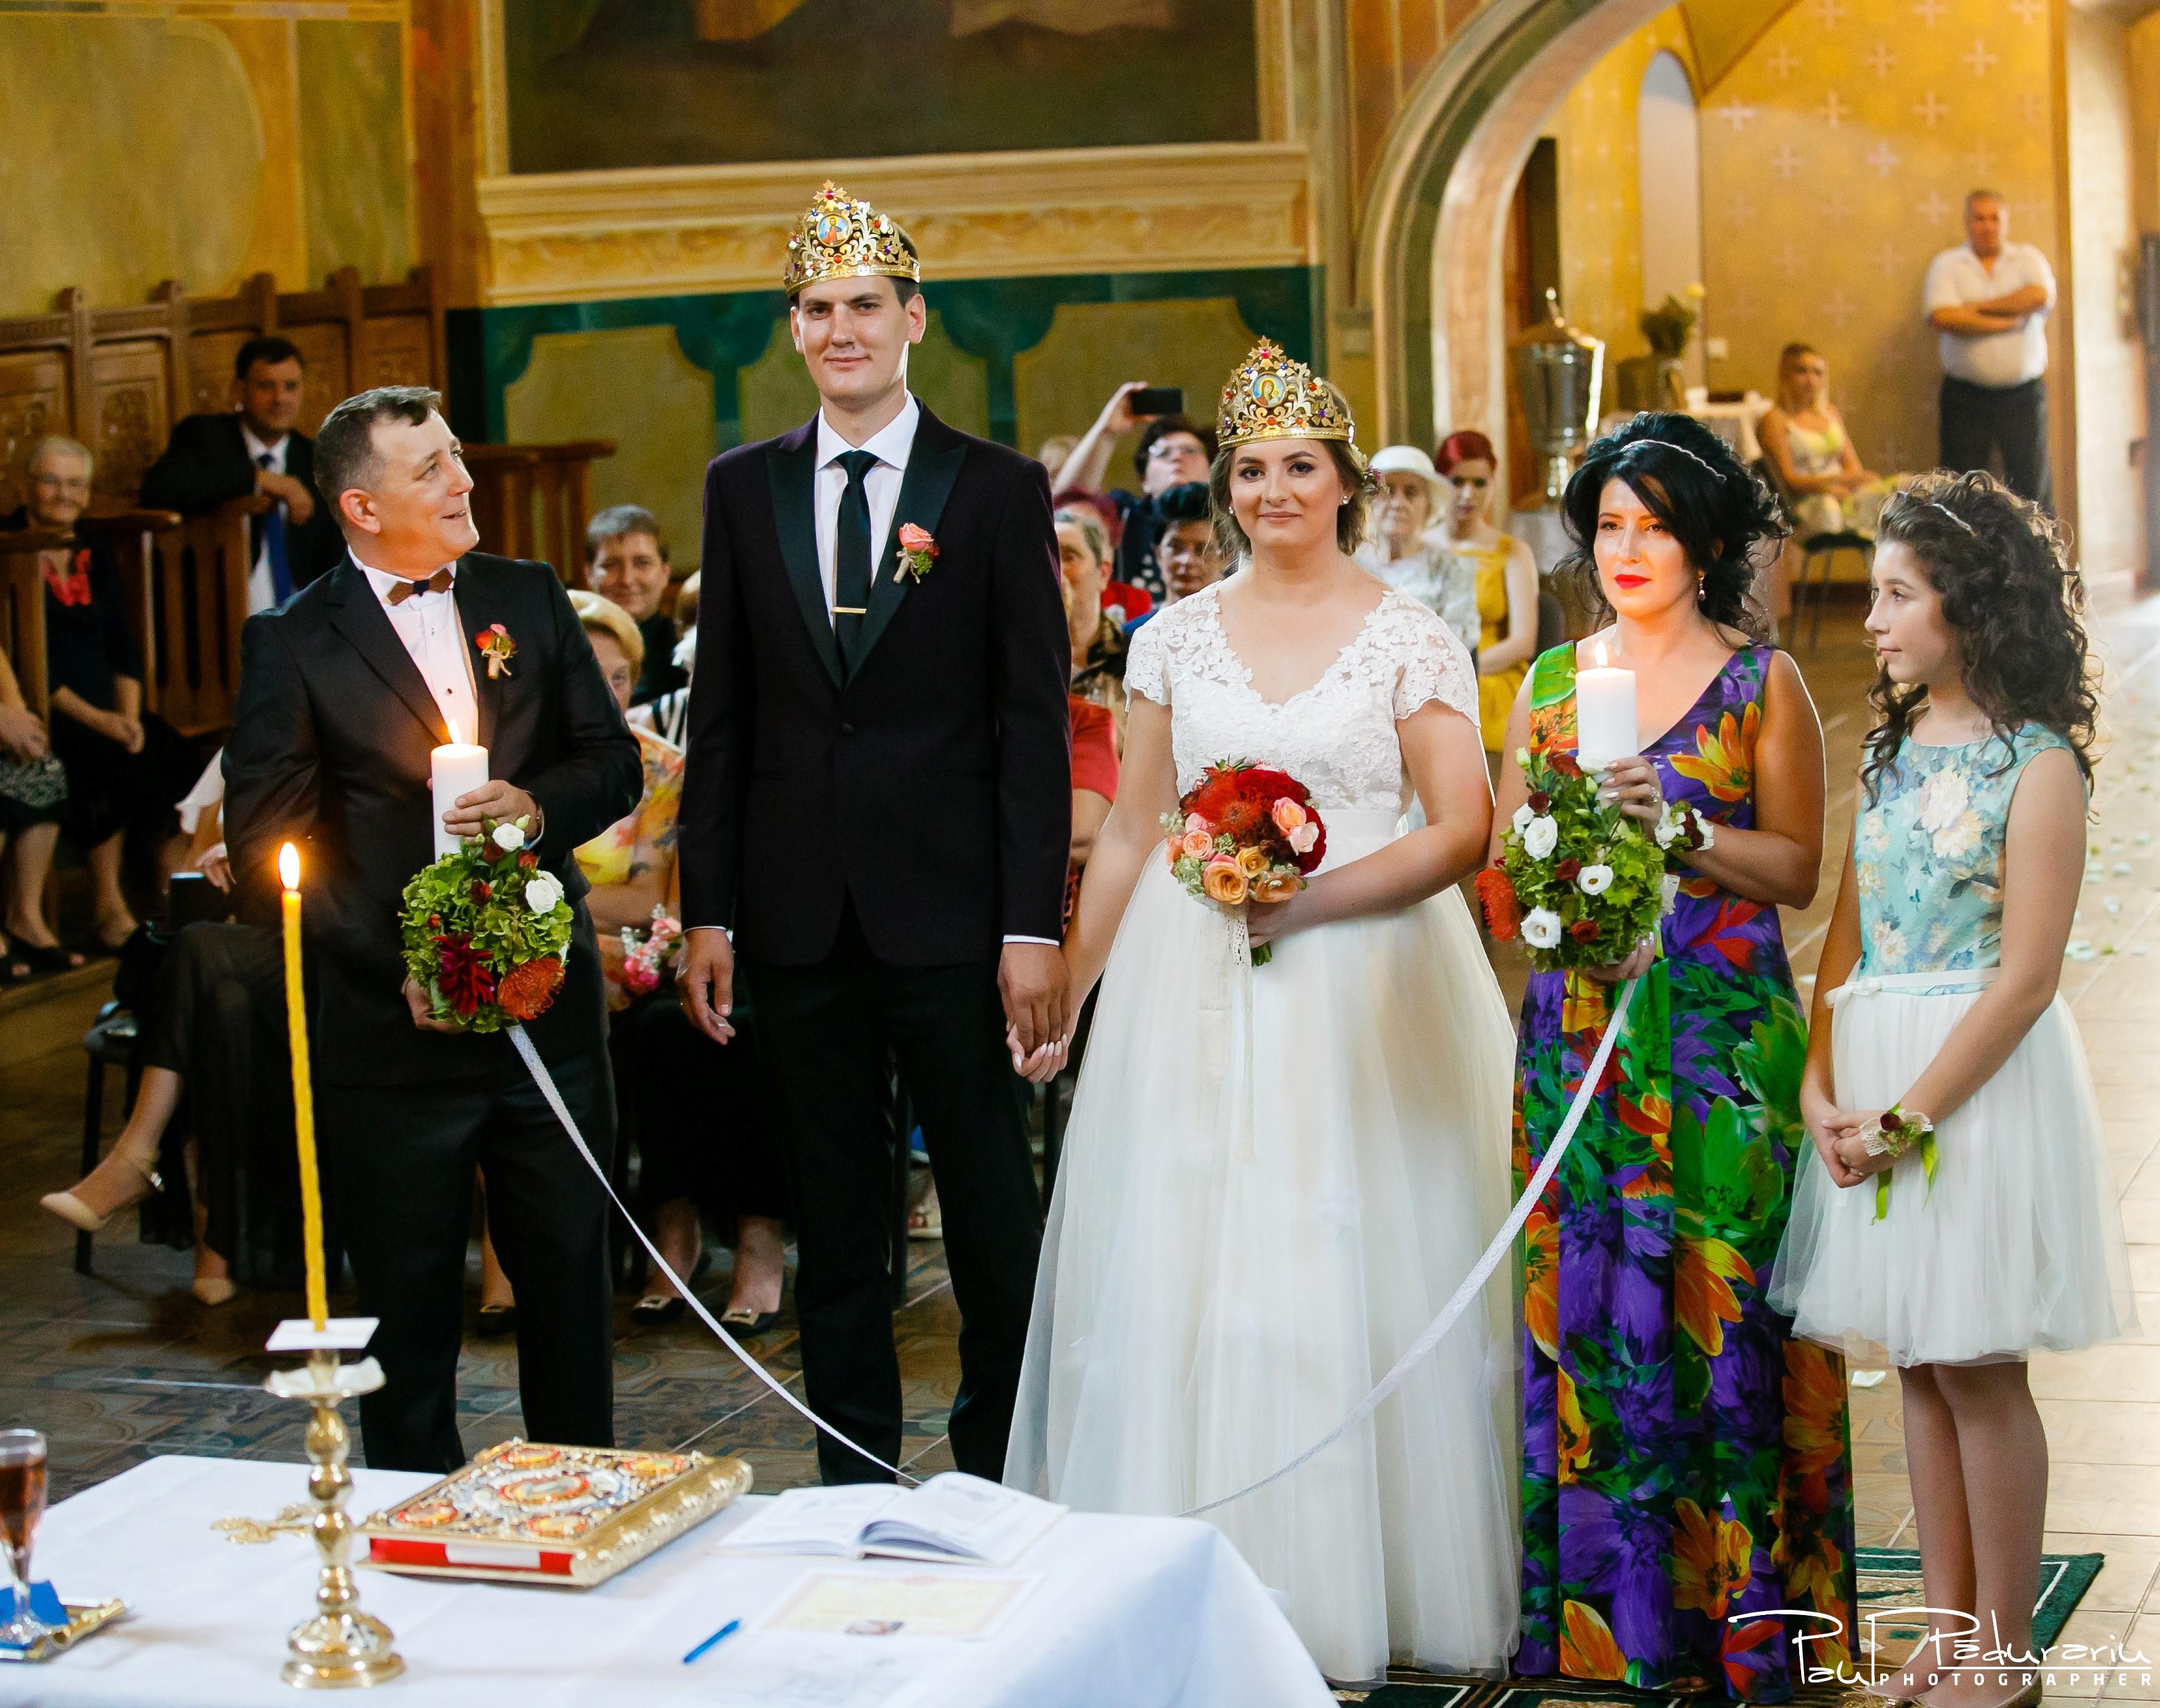 Cristina si Razvan nunta rustica la Bellaria Iasi cununia religioasa cadru miri 3 fotograf profesionist nunta www.paulpadurariu.ro © 2017 Paul Padurariu